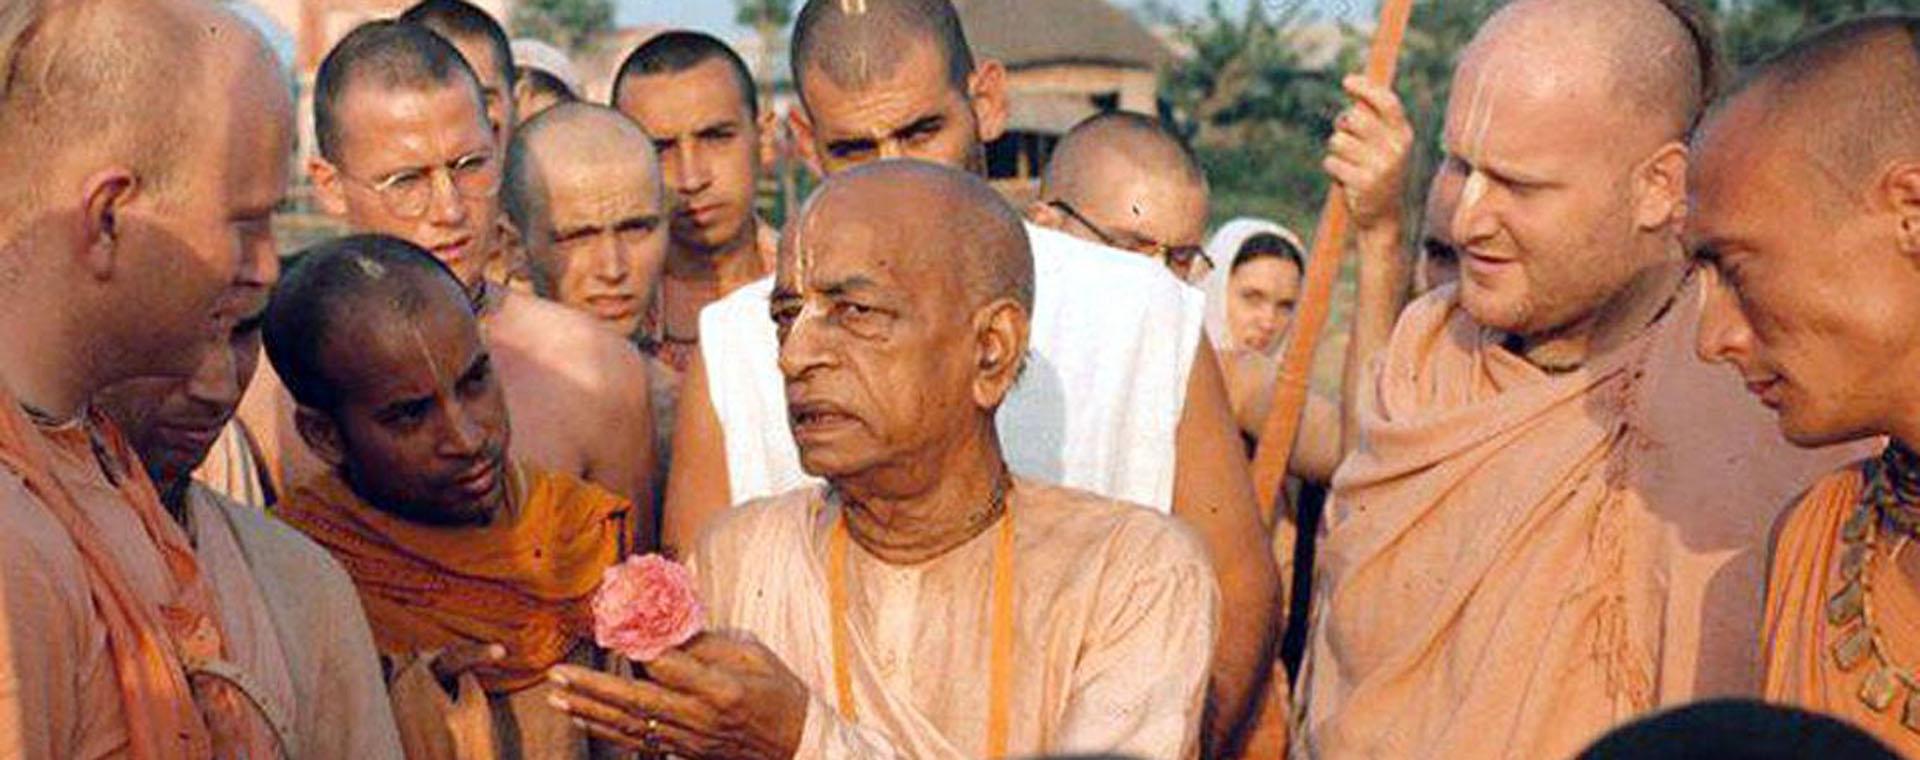 Subhag Swami with Srila Prabhupada